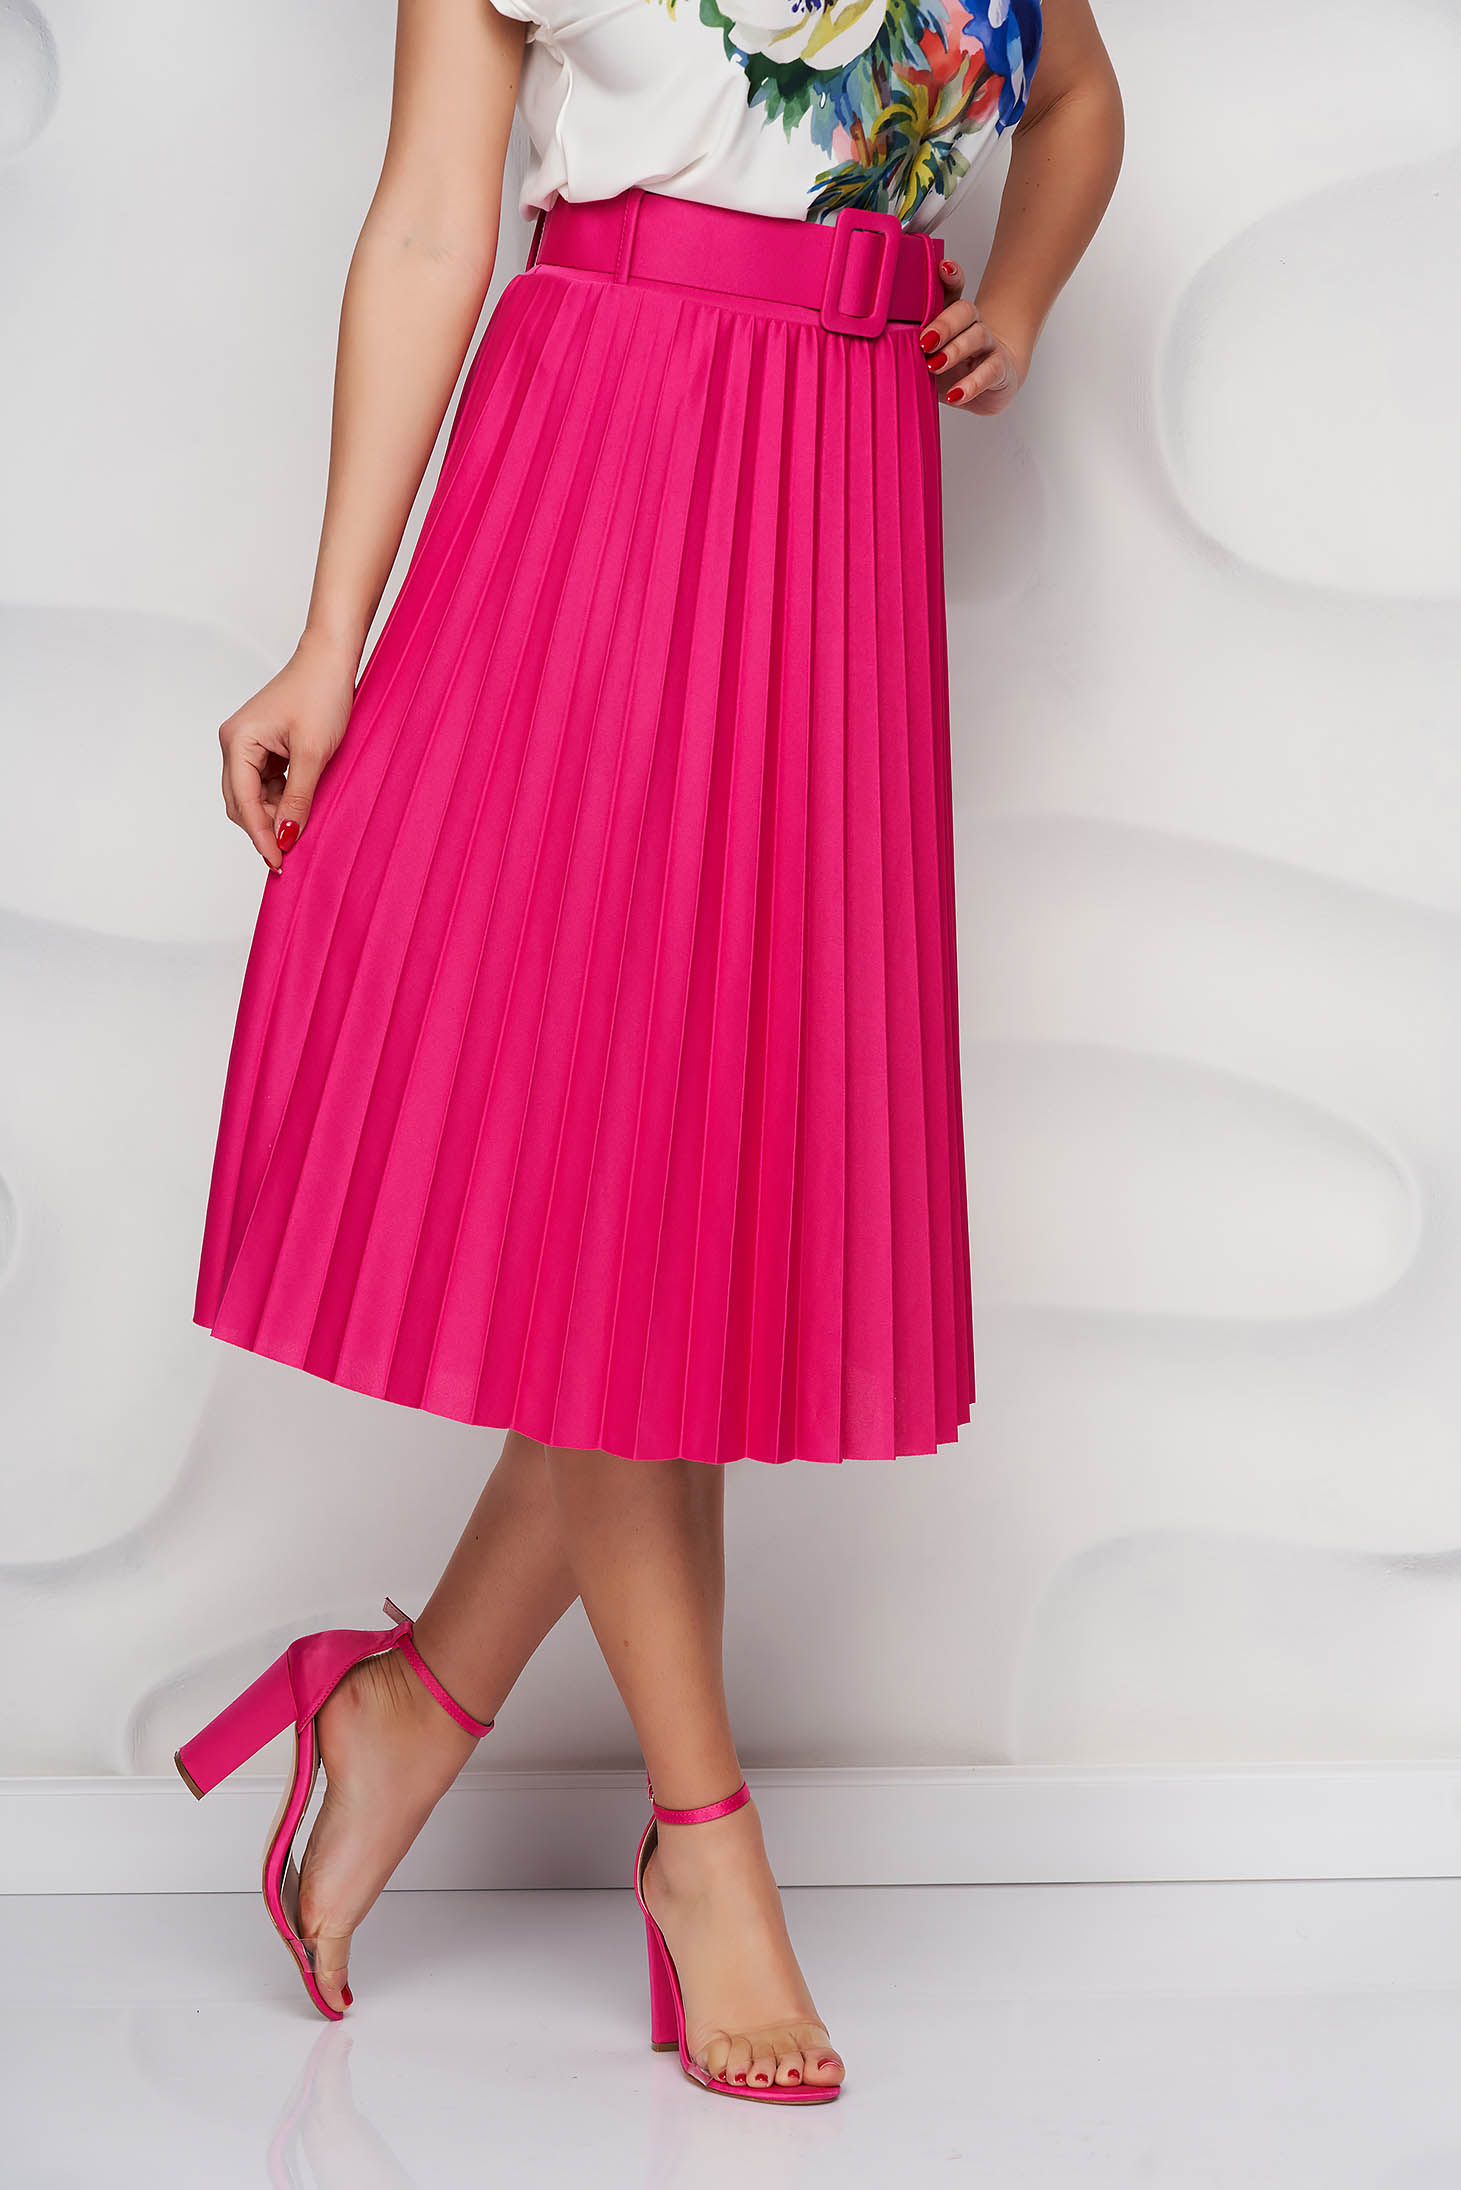 Fuchsia skirt cloche accessorized with belt slightly elastic fabric folded up